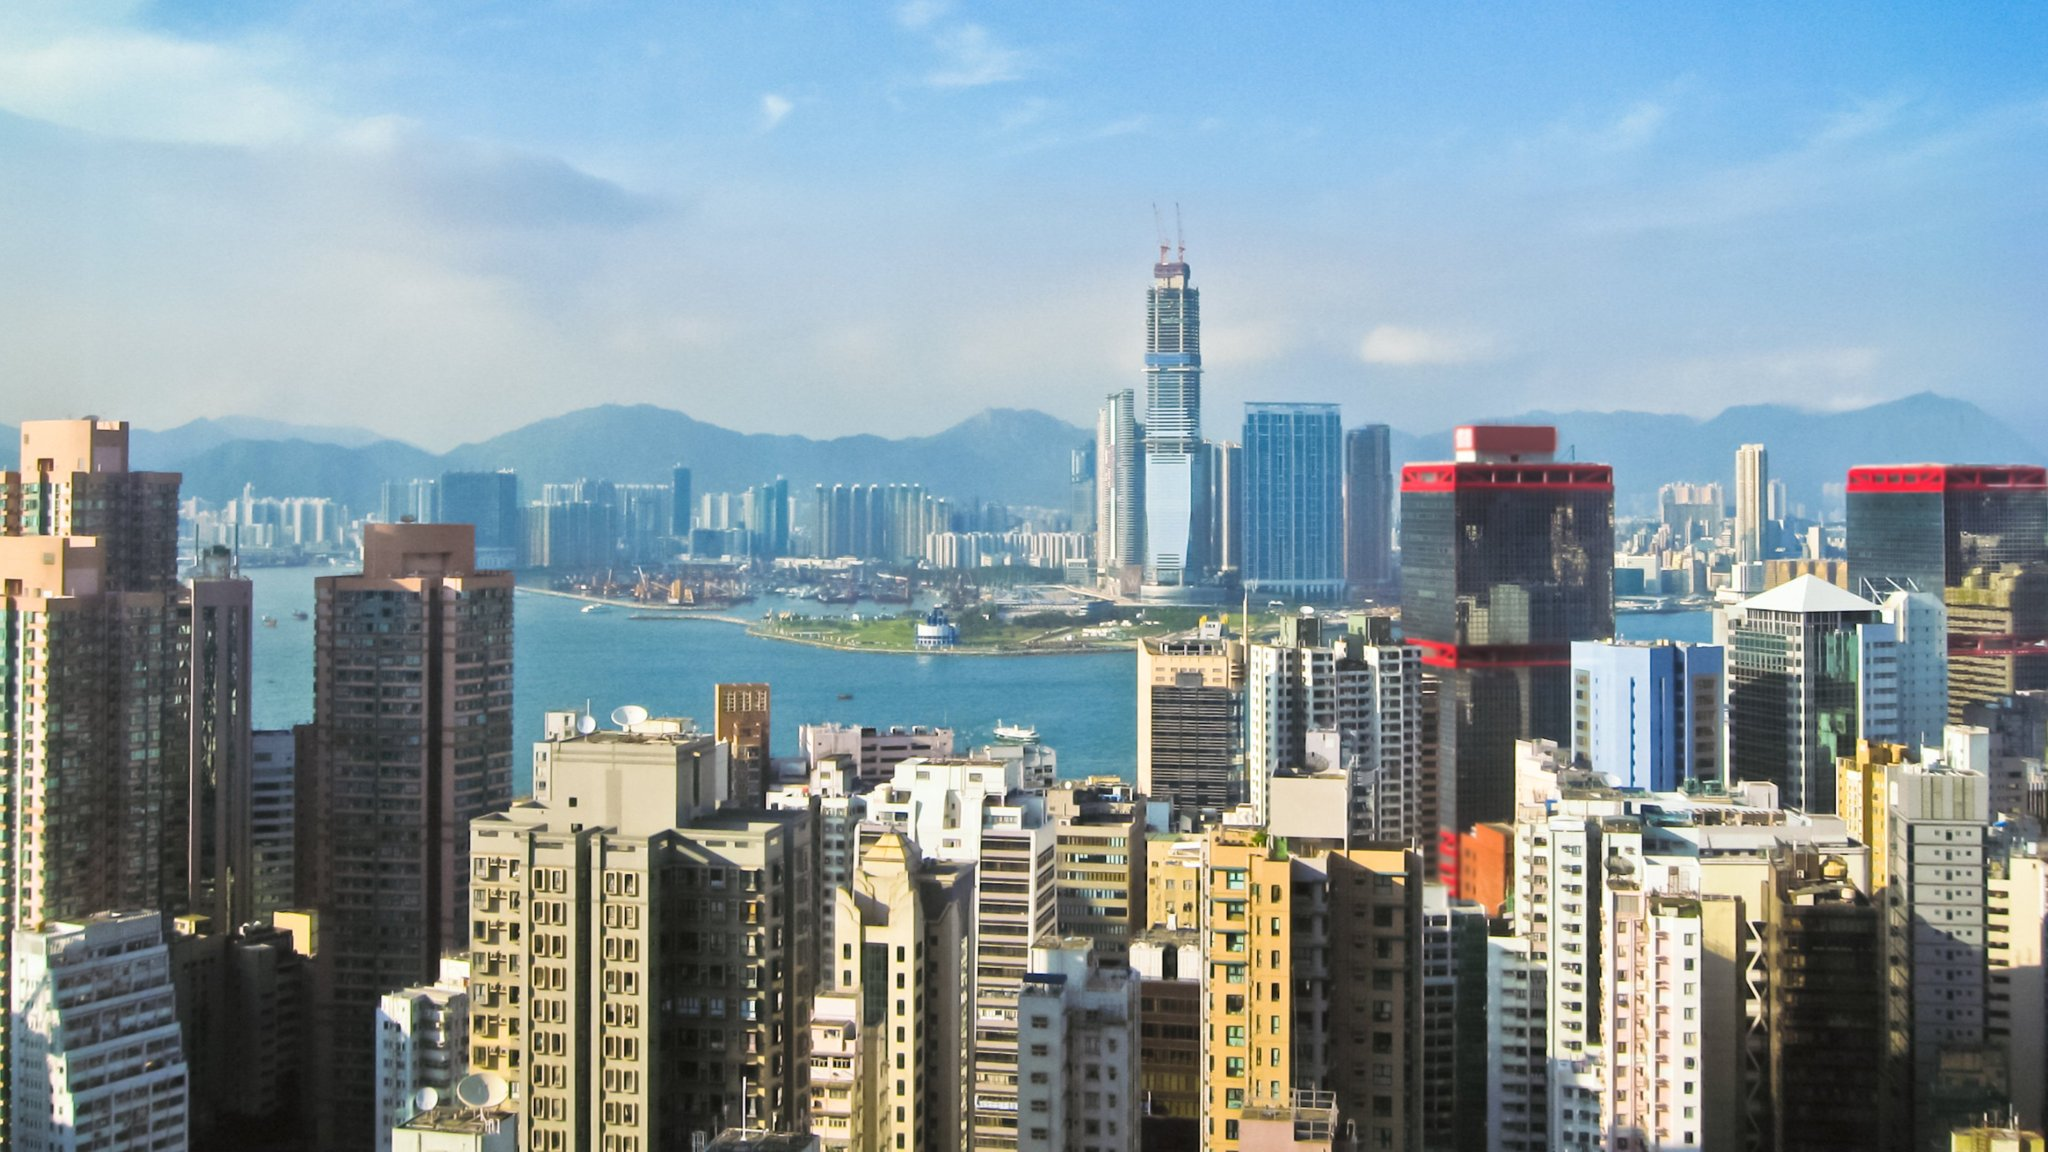 HSBC lures start-ups in Hong Kong with digital wallet